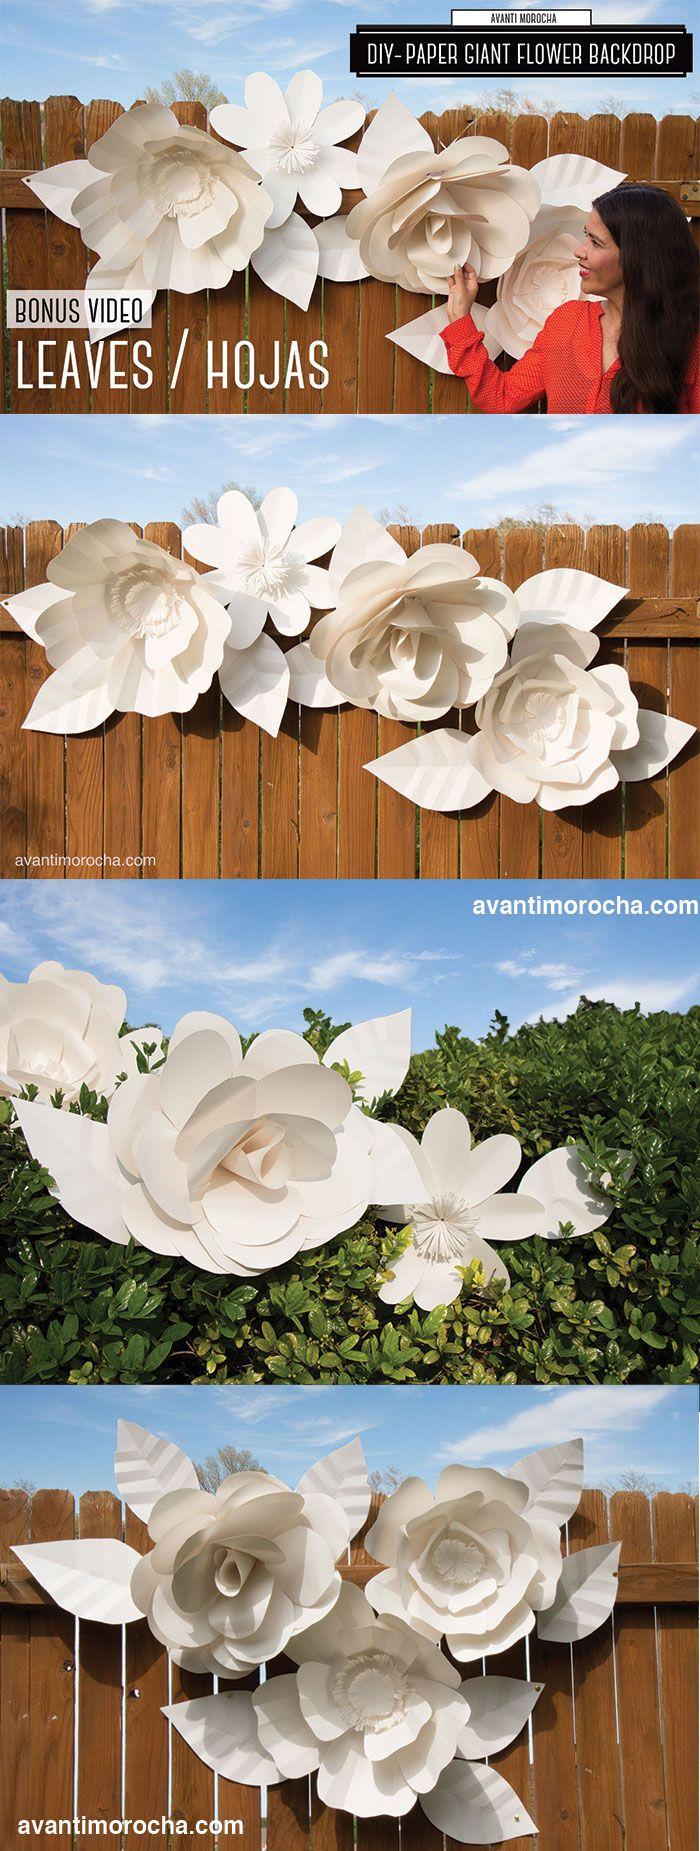 diy paper giant paper flower backdrop